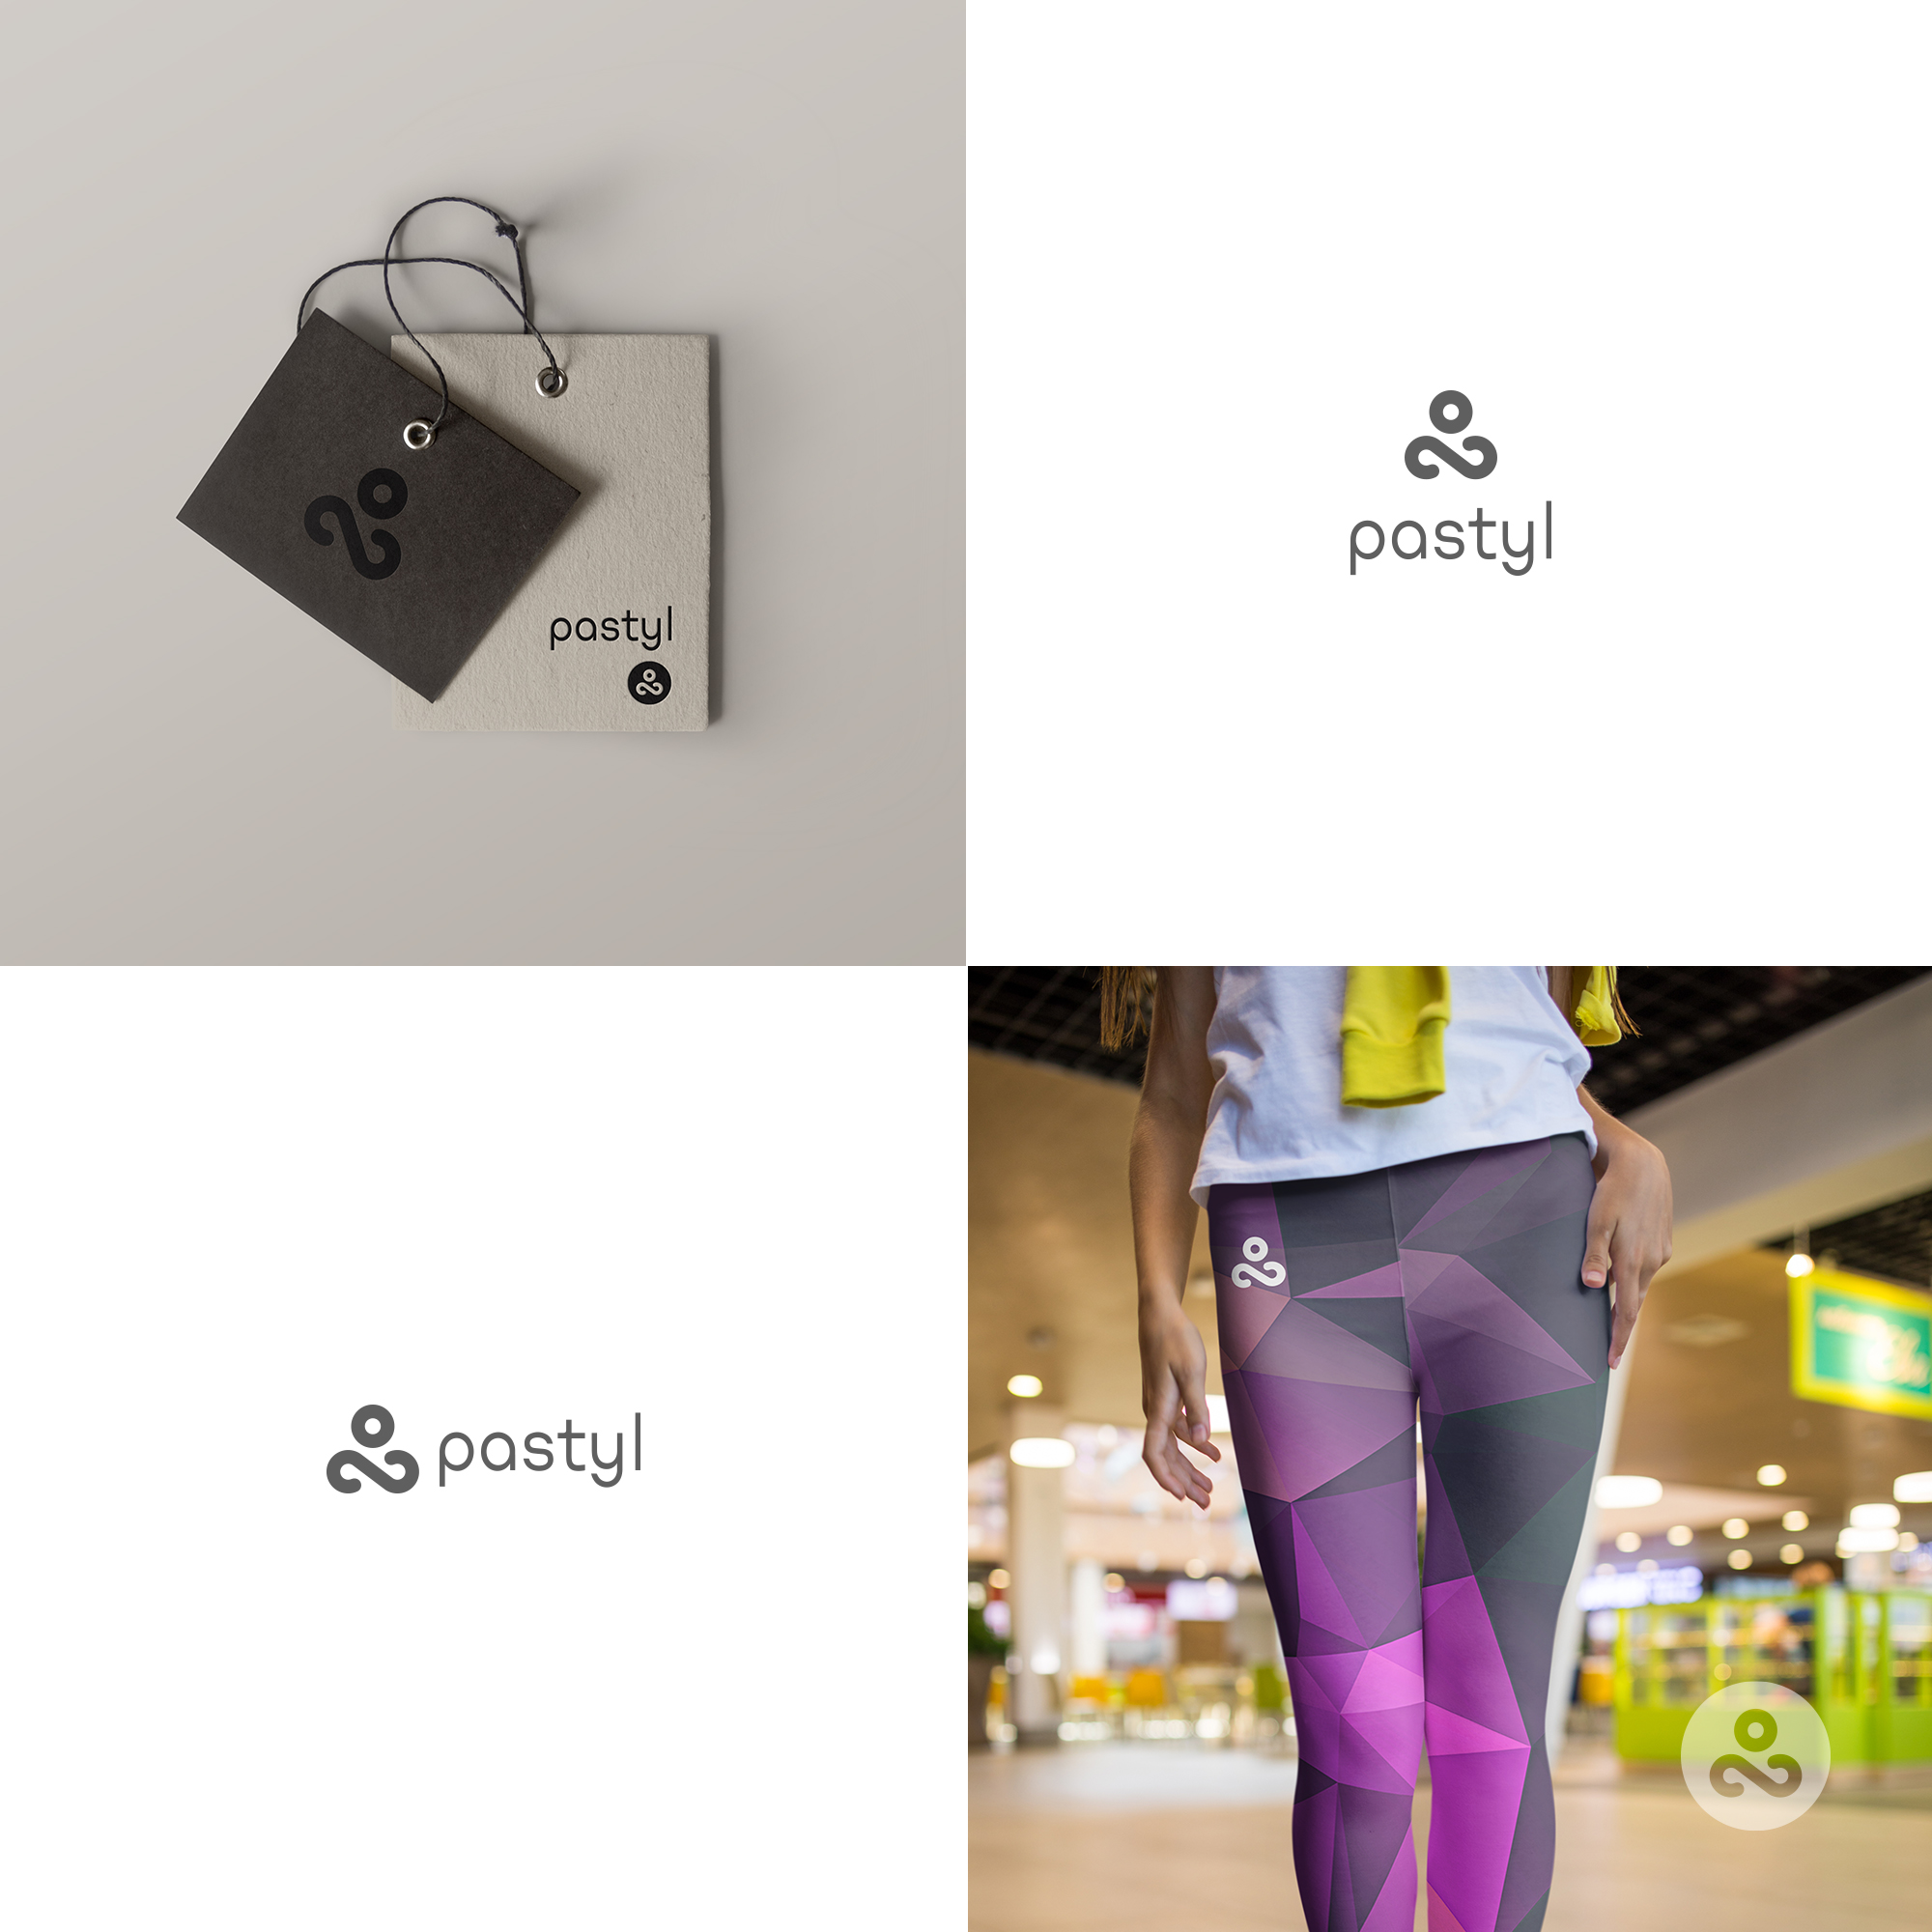 Logo Needed For Women's Fitness/Yoga Equipment Brand   26724   Squadhelp